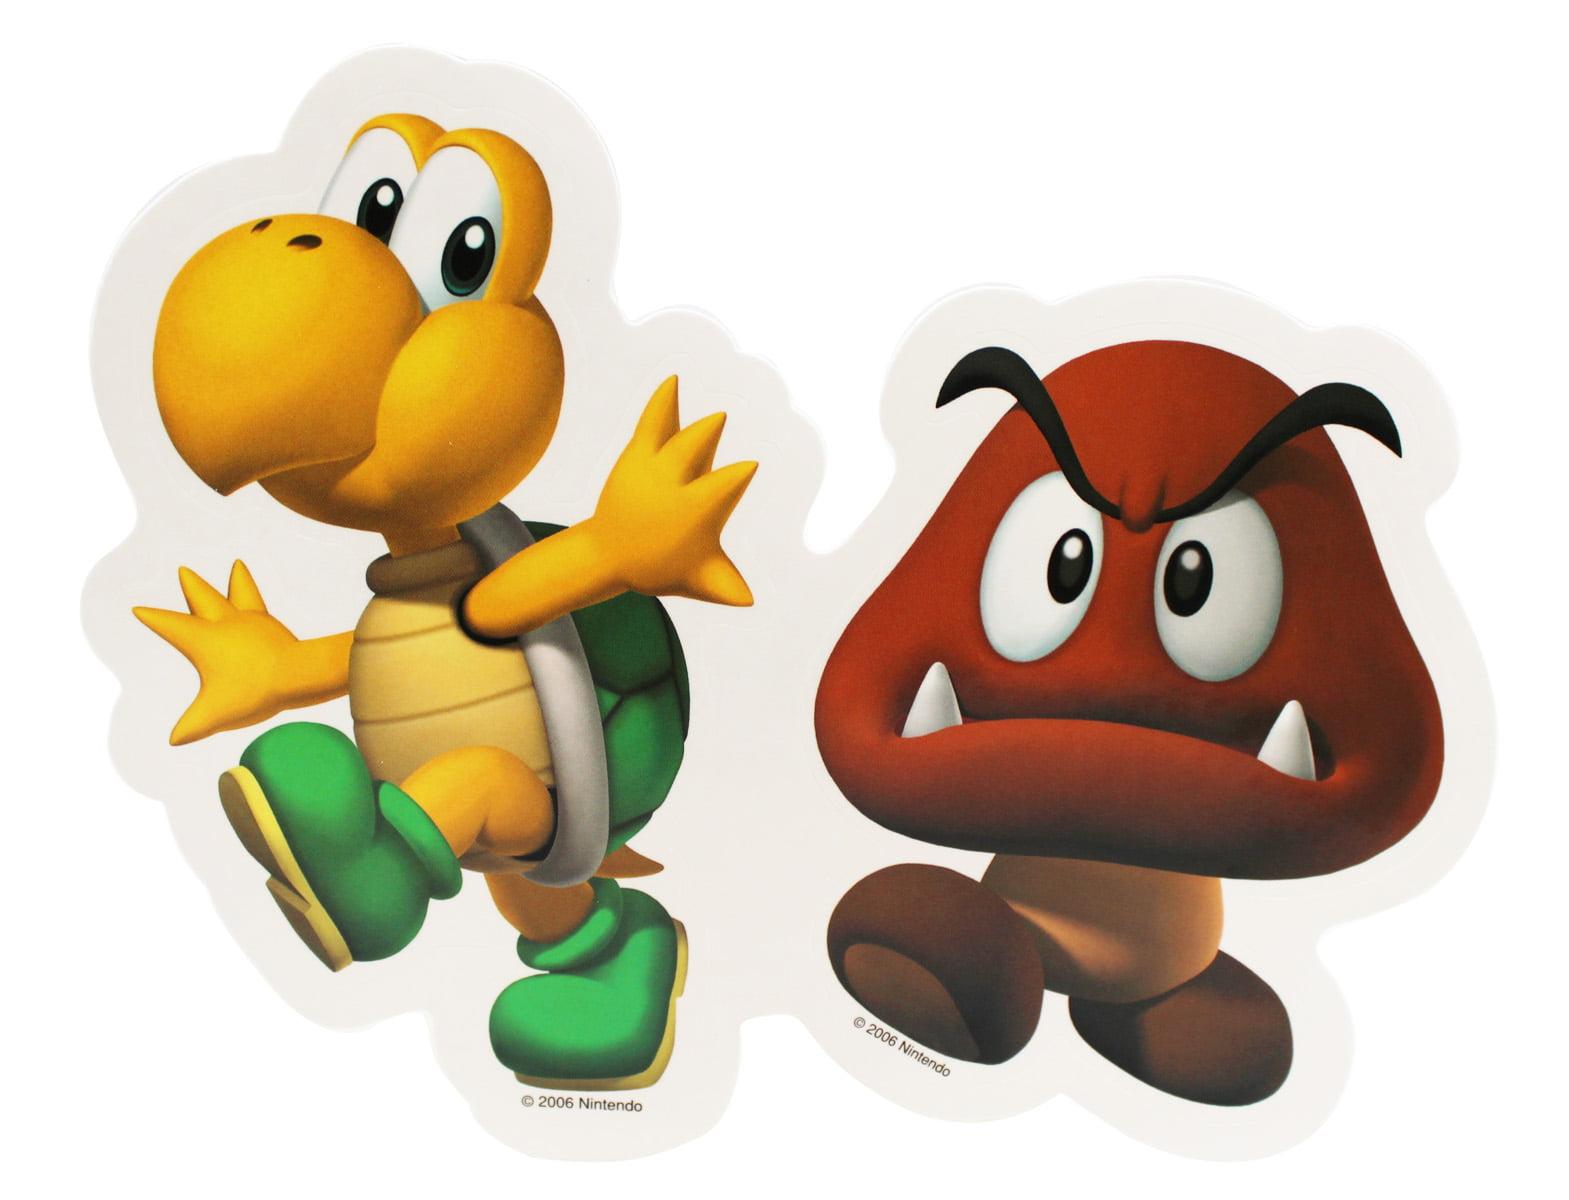 Super Mario Goomba And Koopa Troopa Decorative Decal Sticker